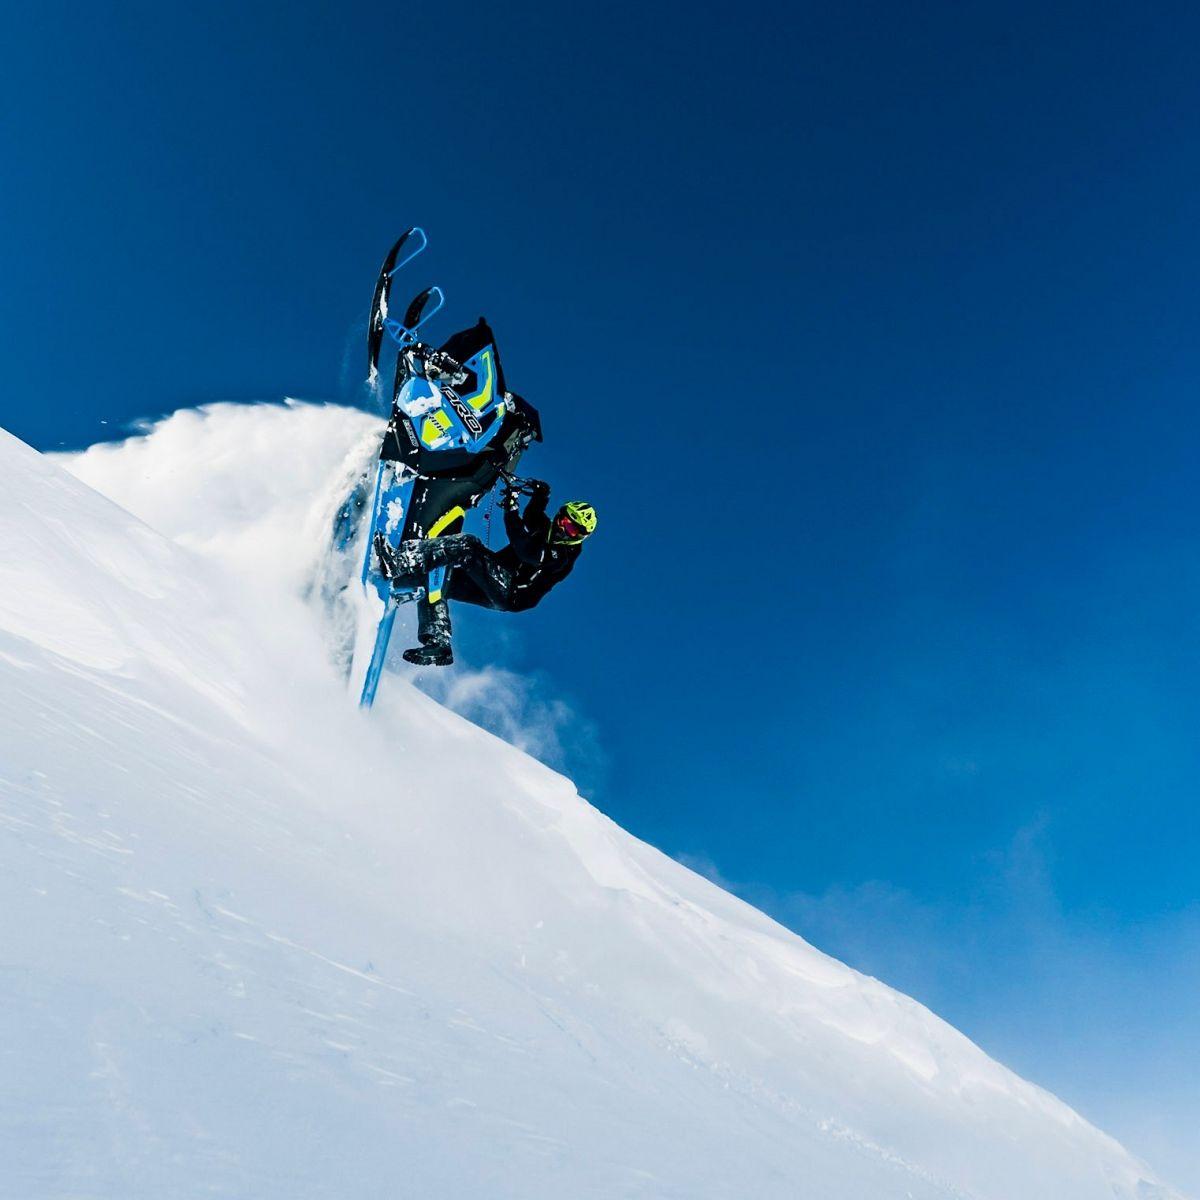 Rider - Tyler Philips